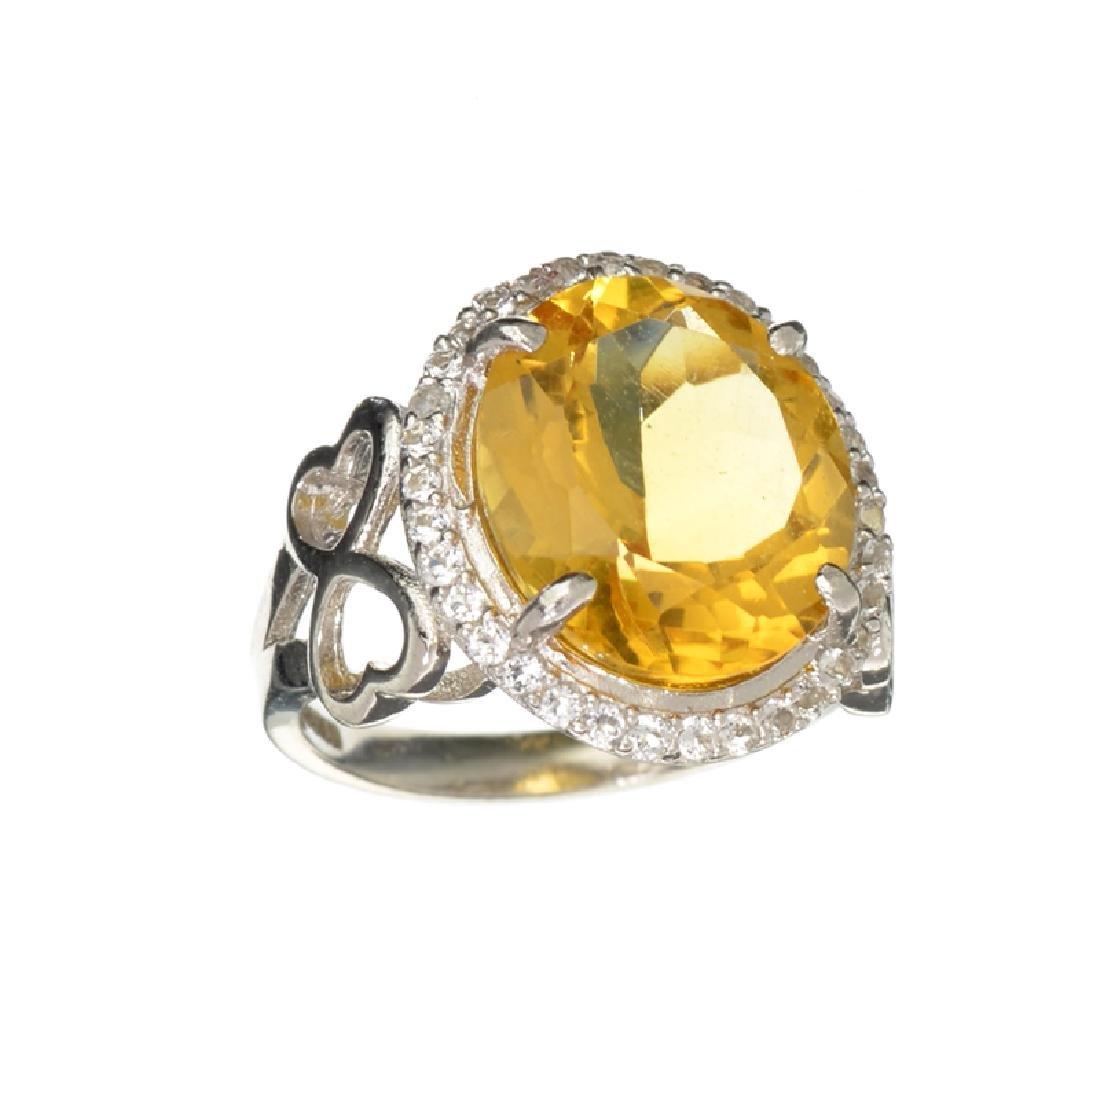 APP: 0.9k Fine Jewelry Designer Sebastian, 7.20CT